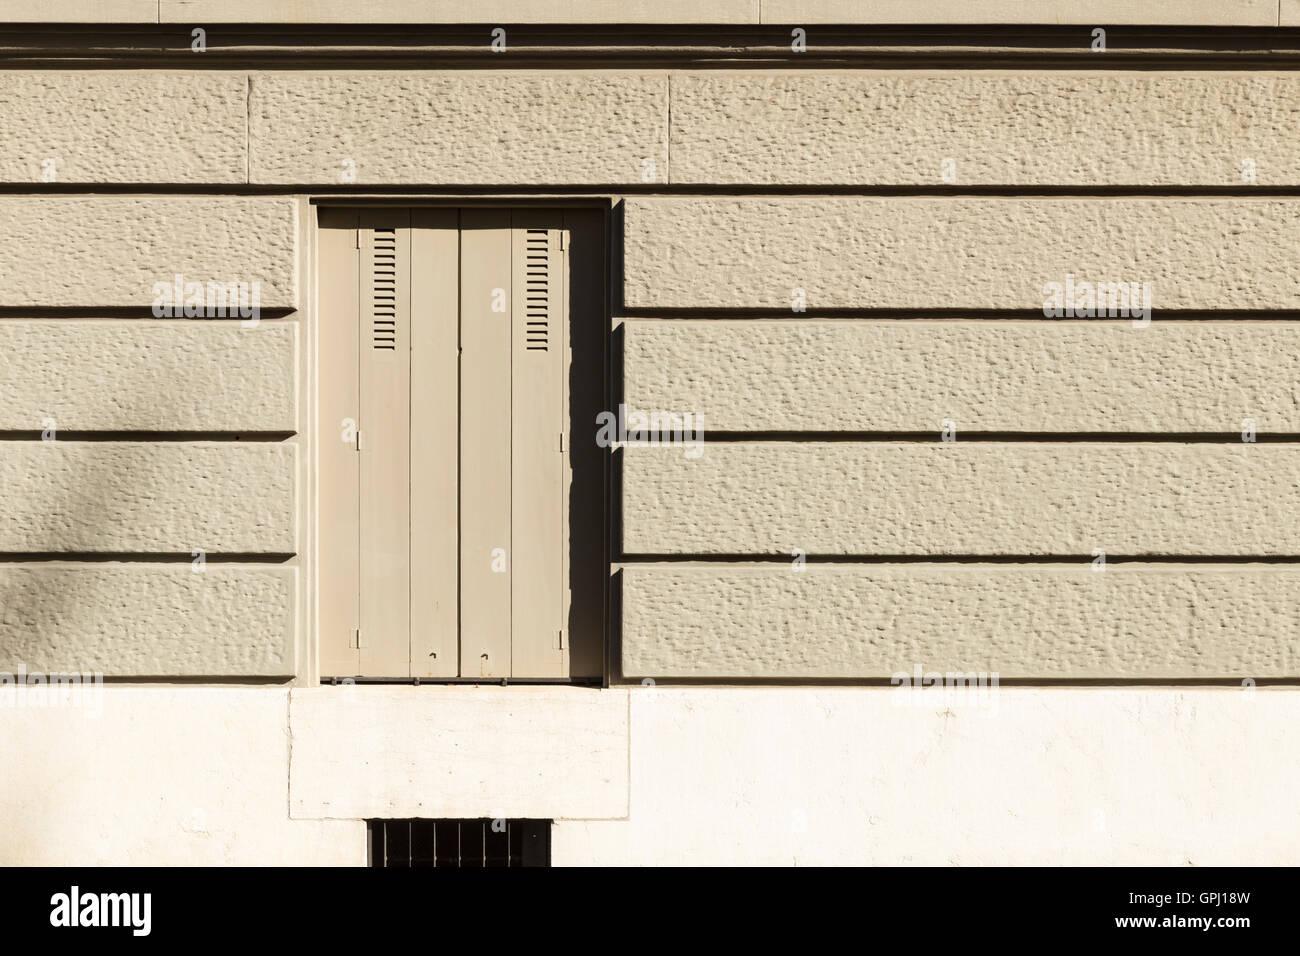 Grautöne Wand Wandtattoo Braune Wand 3 Best 23 Besten Graue Wandfarben